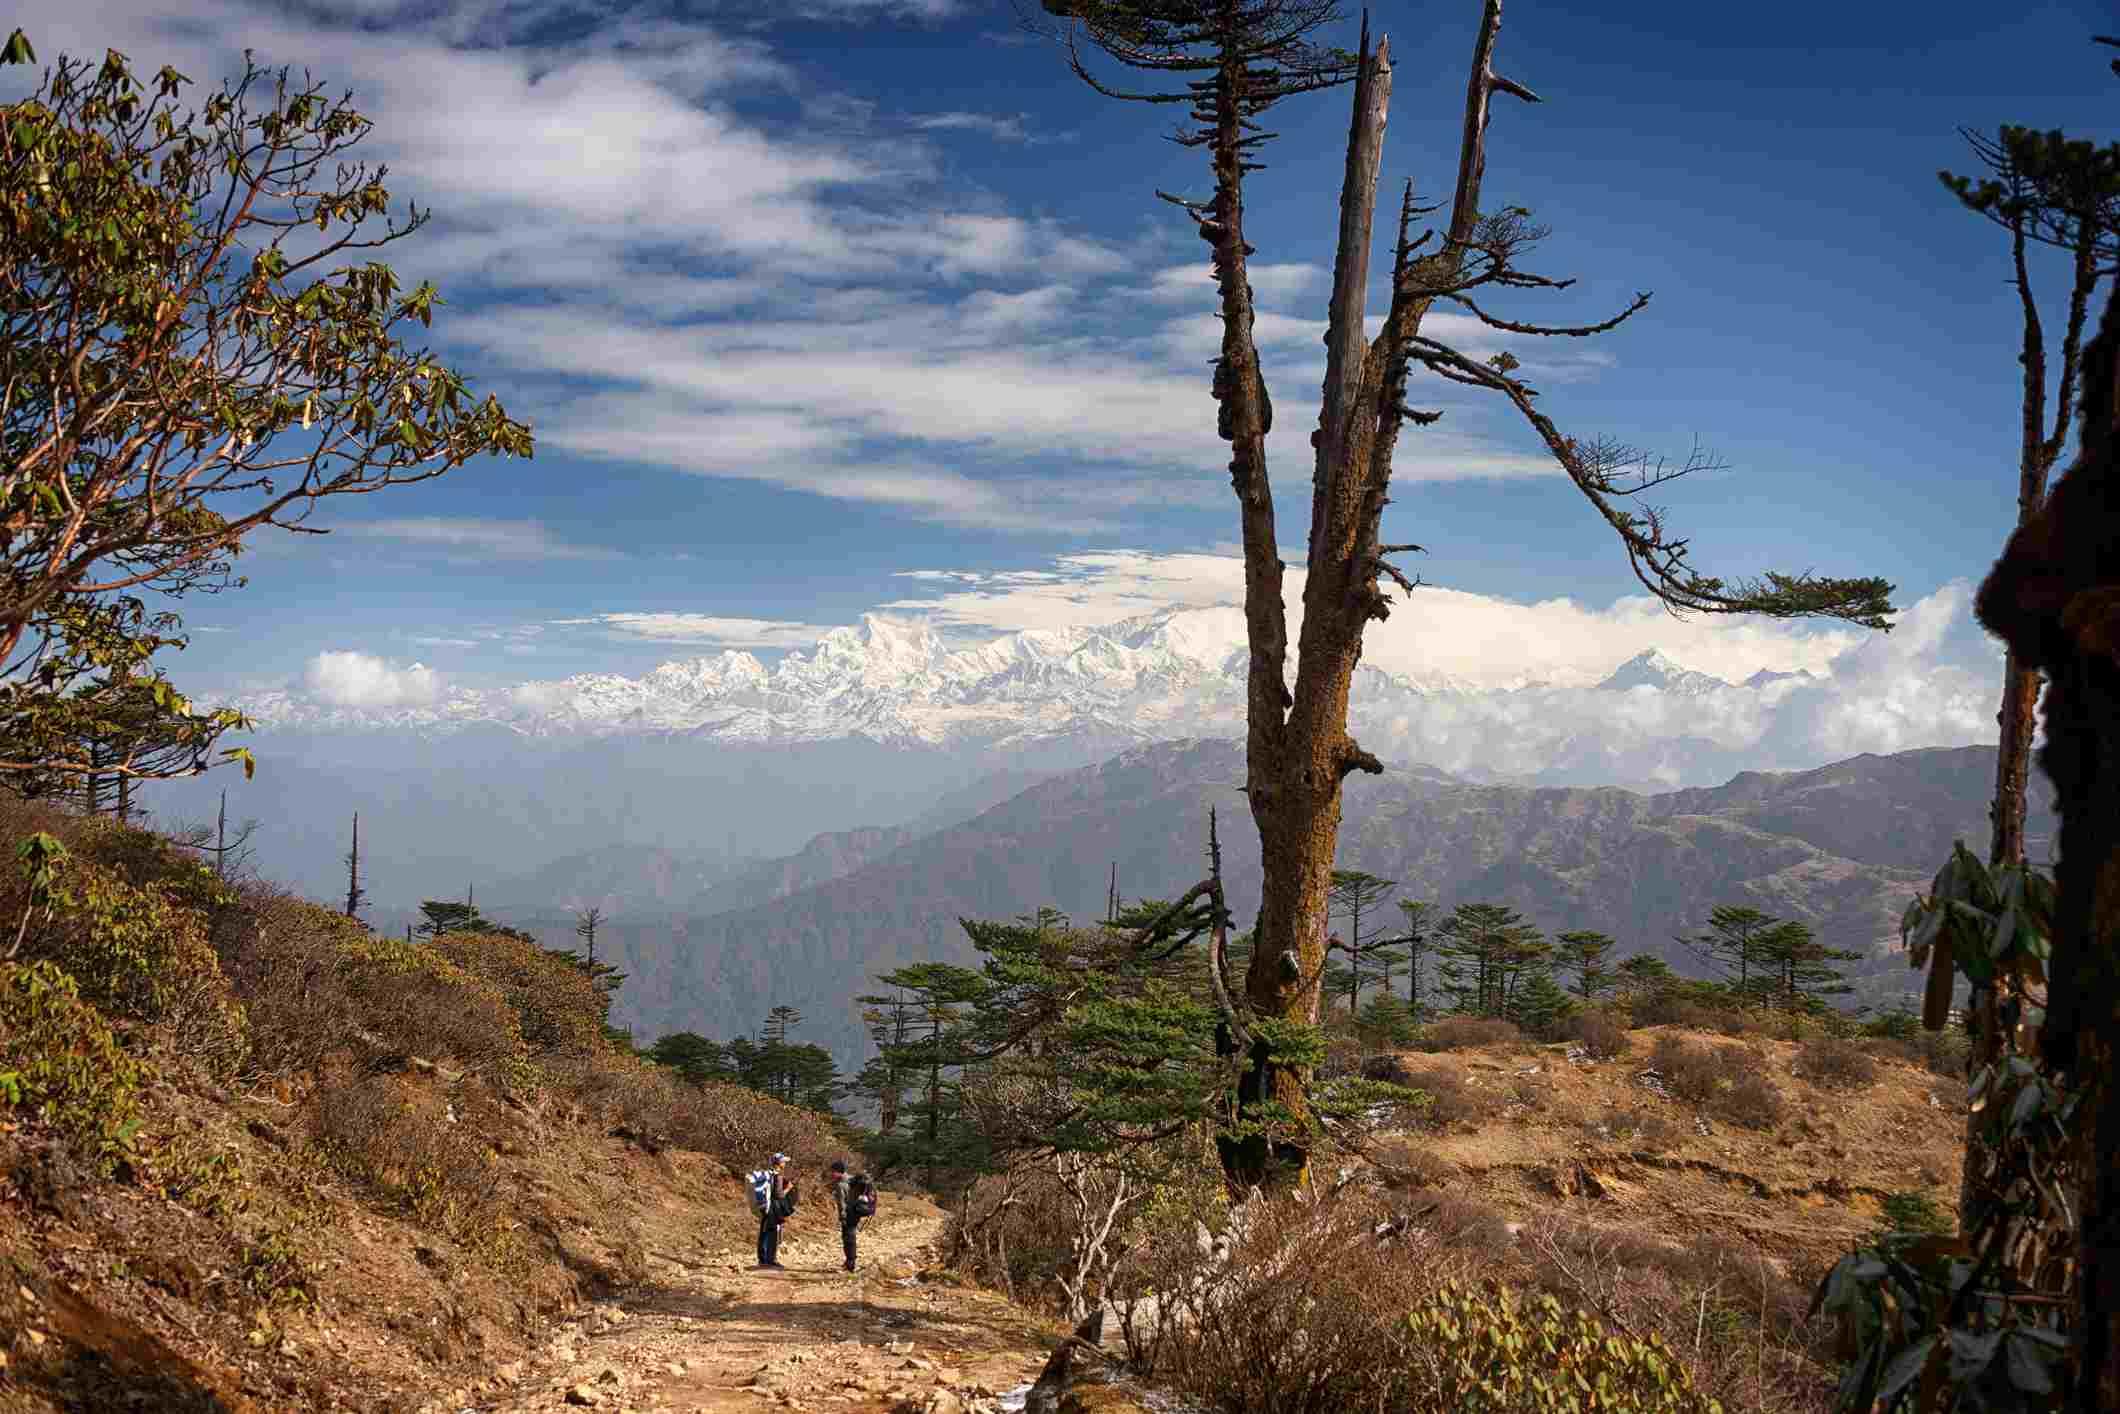 View while trekking from Sandakphu to Phalut, Darjeeling